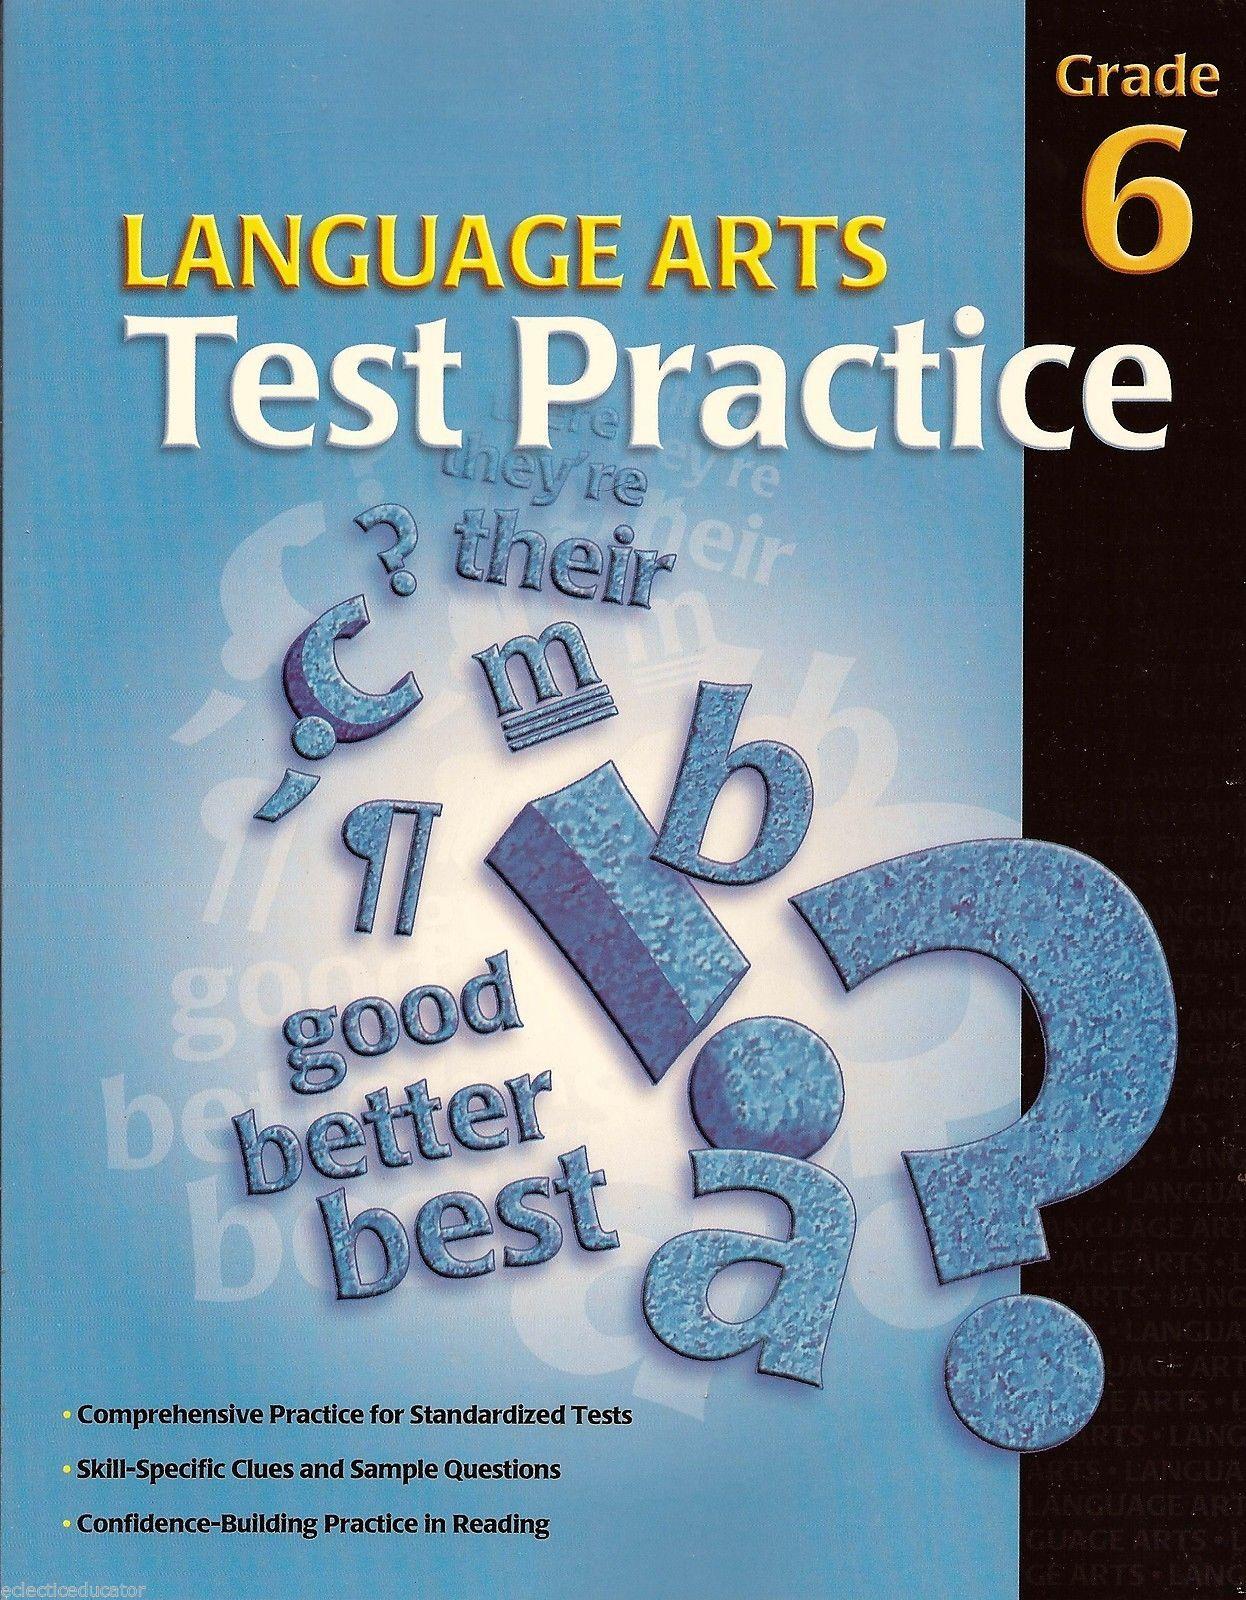 Language Arts Test Practice Grade 6 New School Specialty